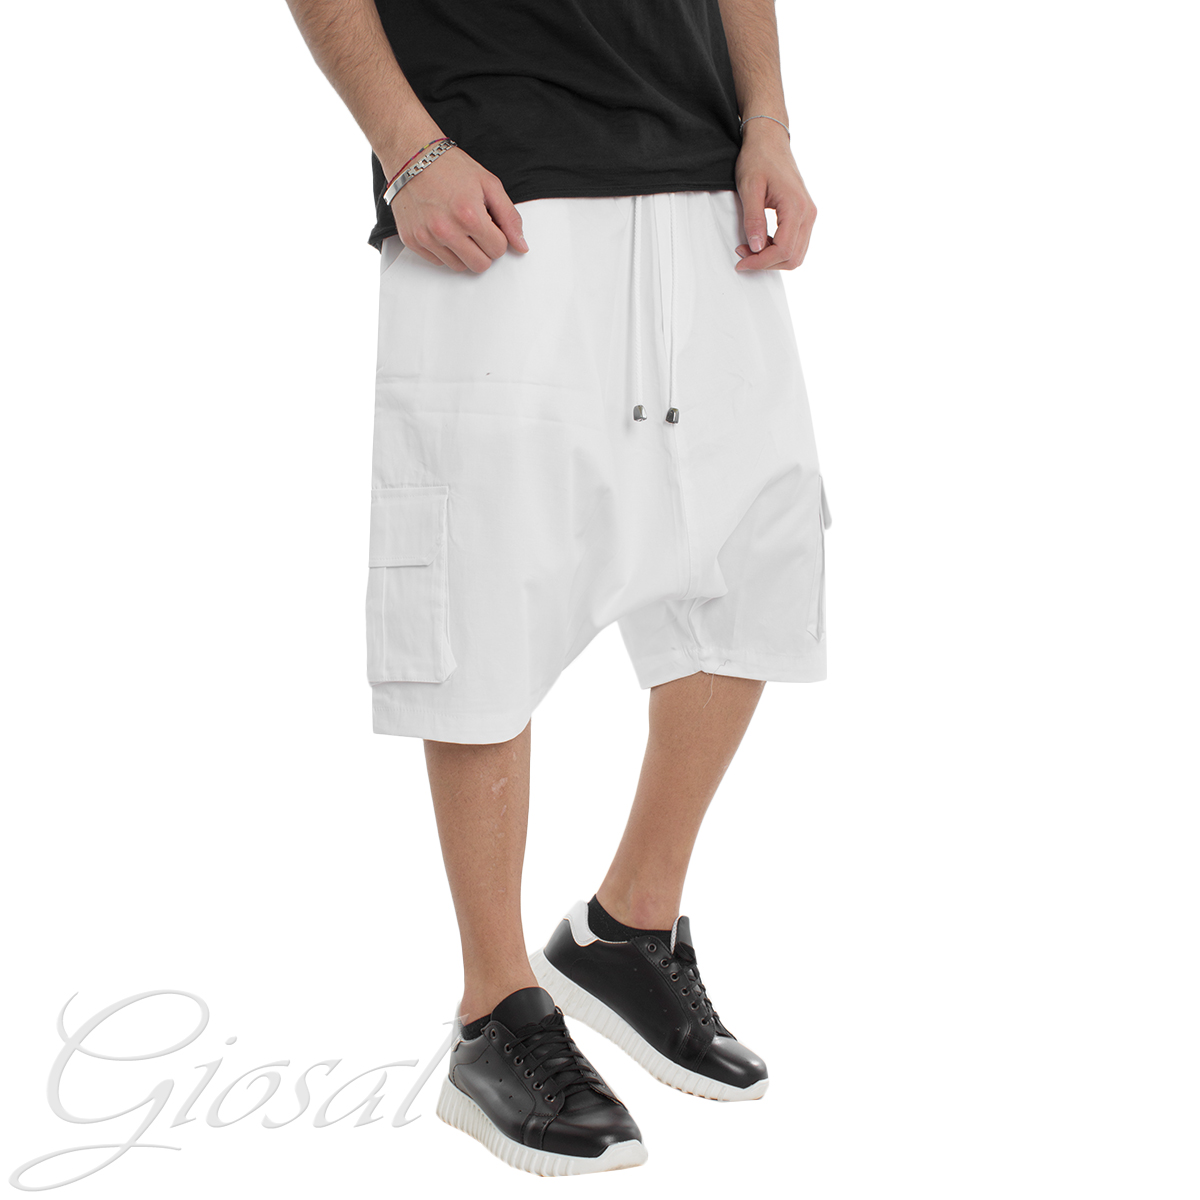 Pantalone-Uomo-Corto-Bermuda-Cavallo-Basso-Tinta-Unita-Vari-Colori-Casual-GIOSAL miniatura 13